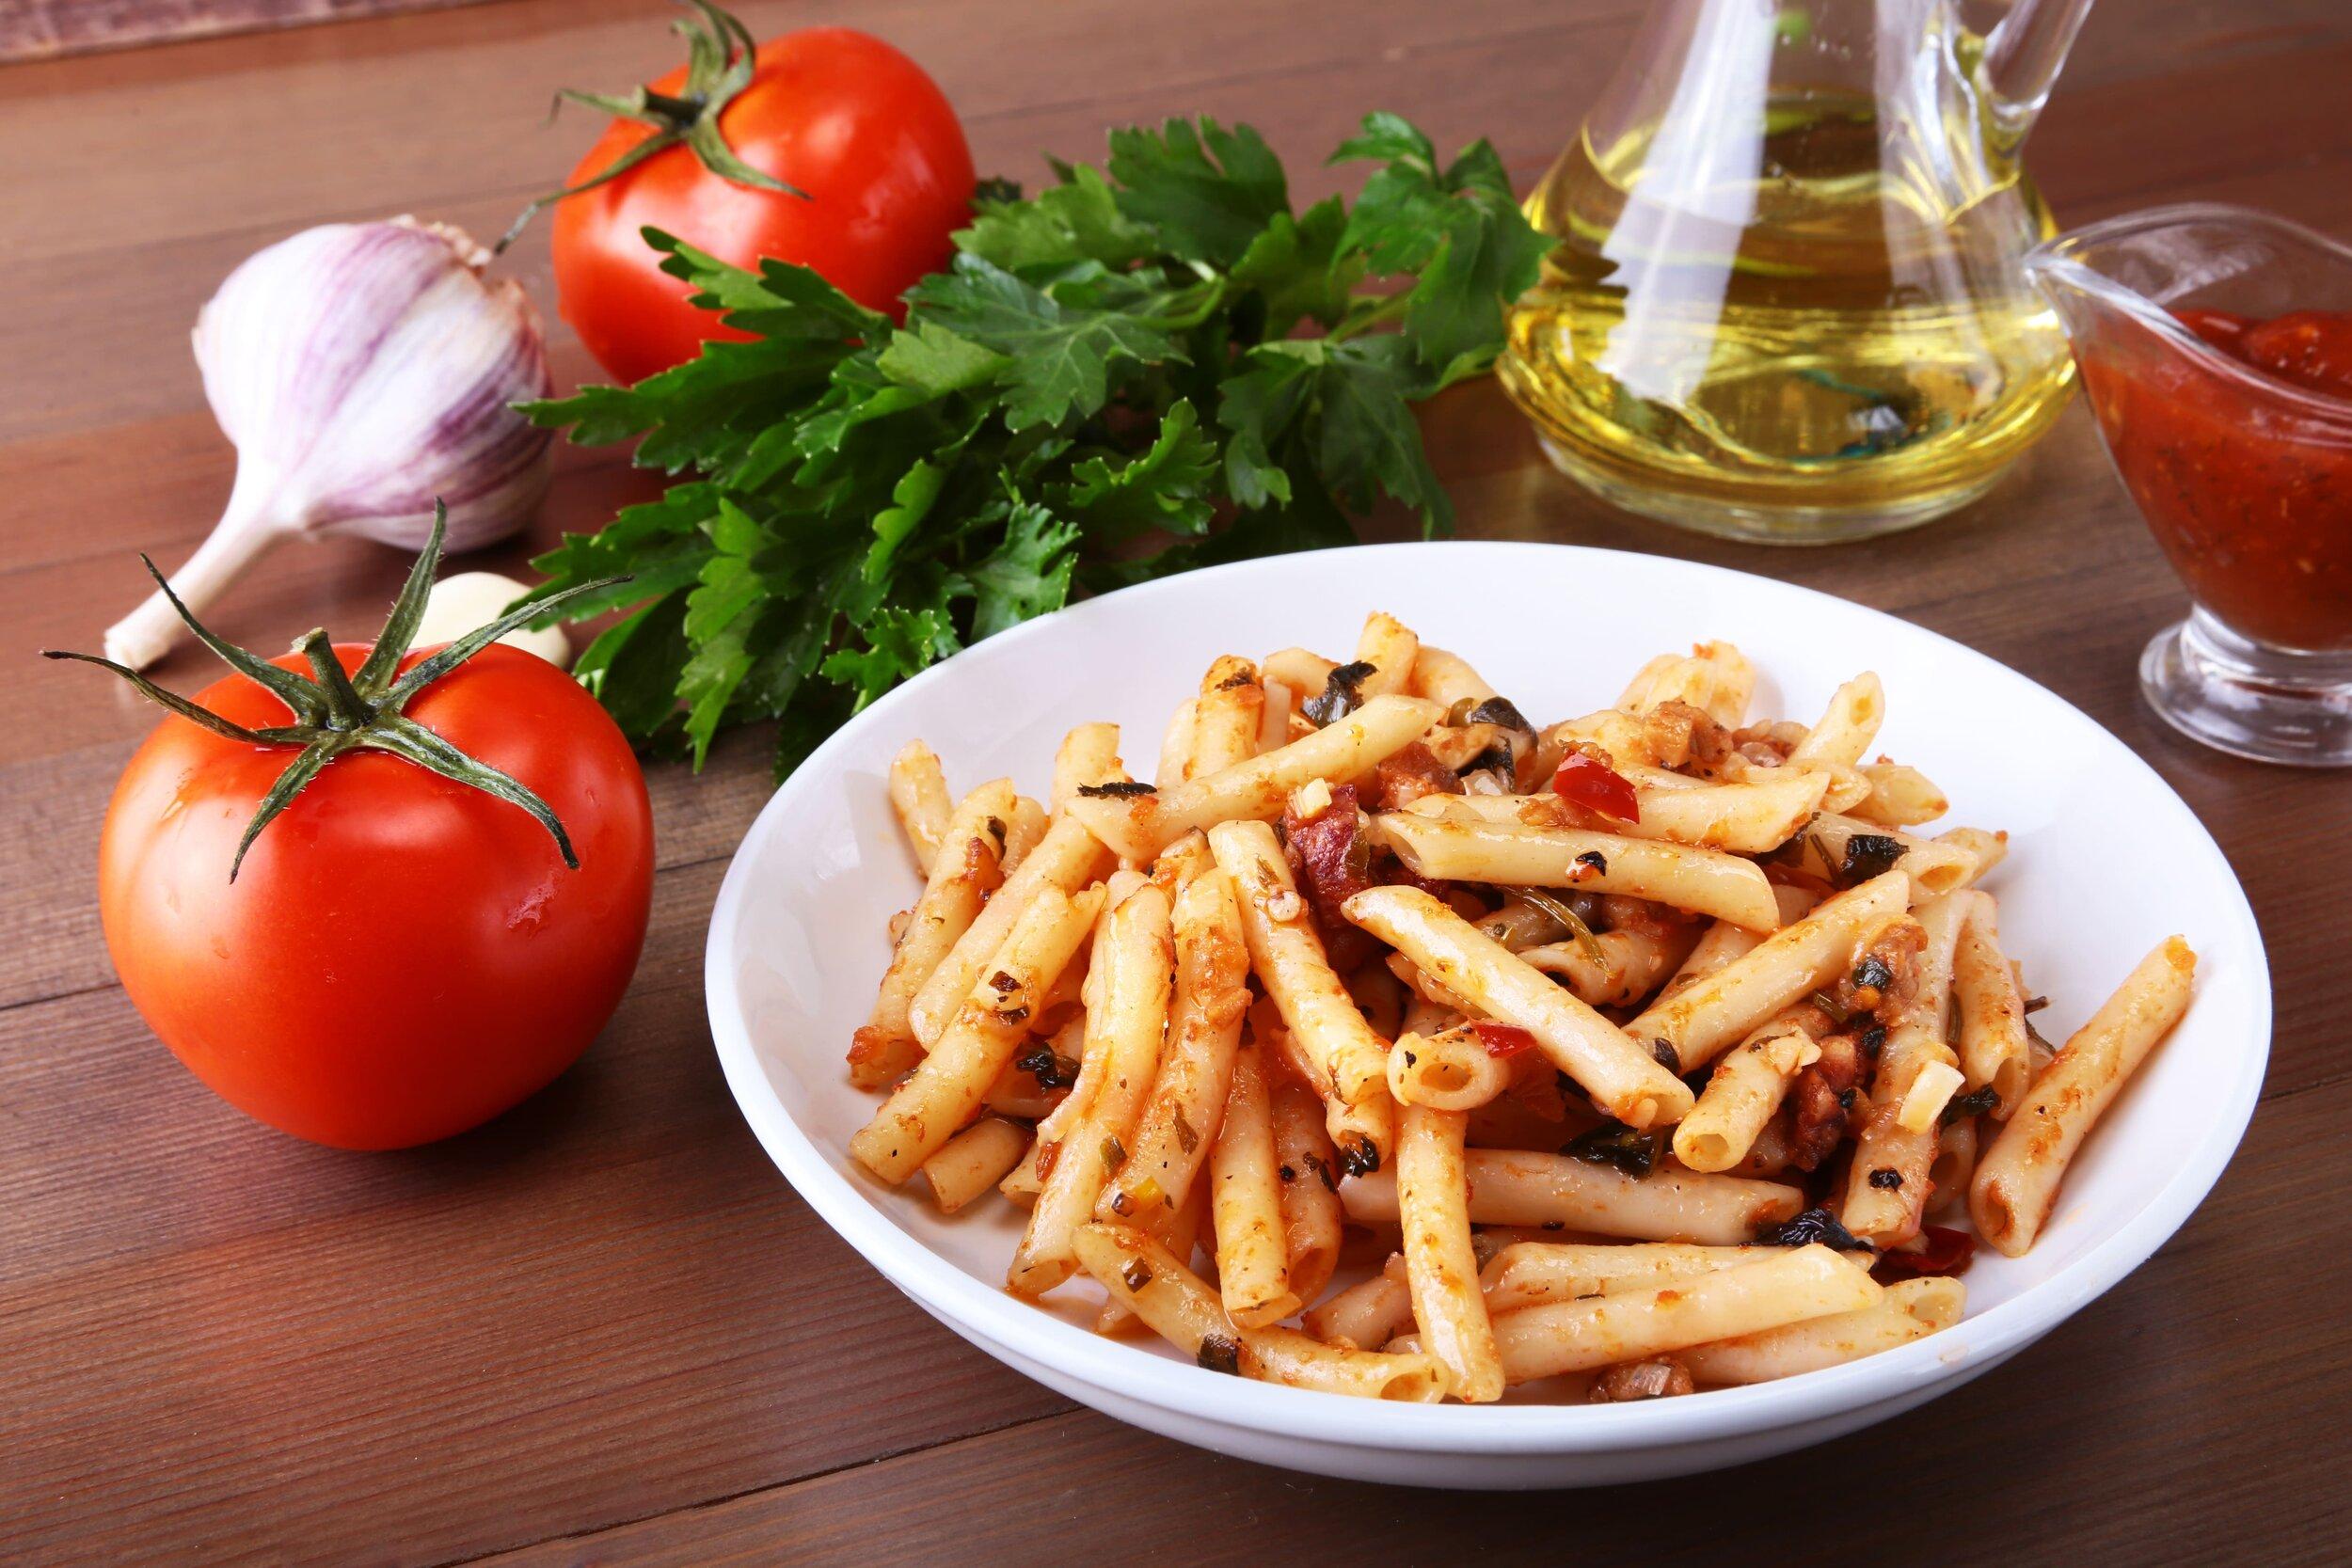 Spicy vegan Italian pasta, Penne all-Arrabbiata